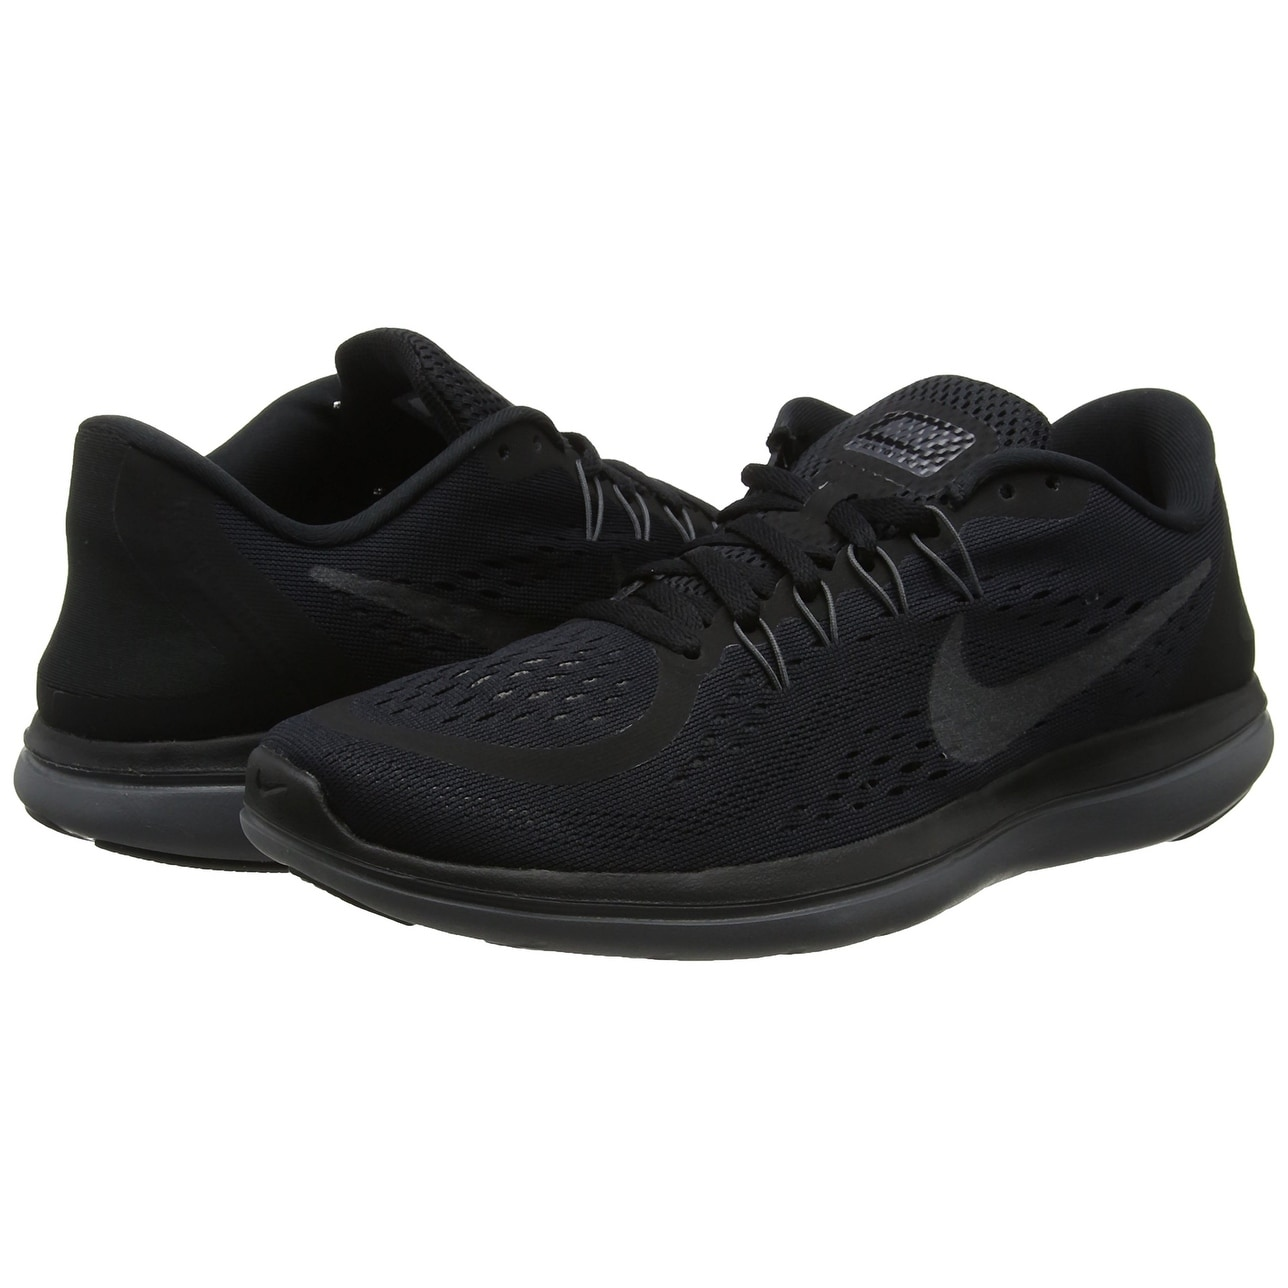 sports shoes 89533 b4e75 Women s Nike Flex 2017 RN Running Shoe Black Metallic Hematite Anthracite Dark  Grey, US Women s